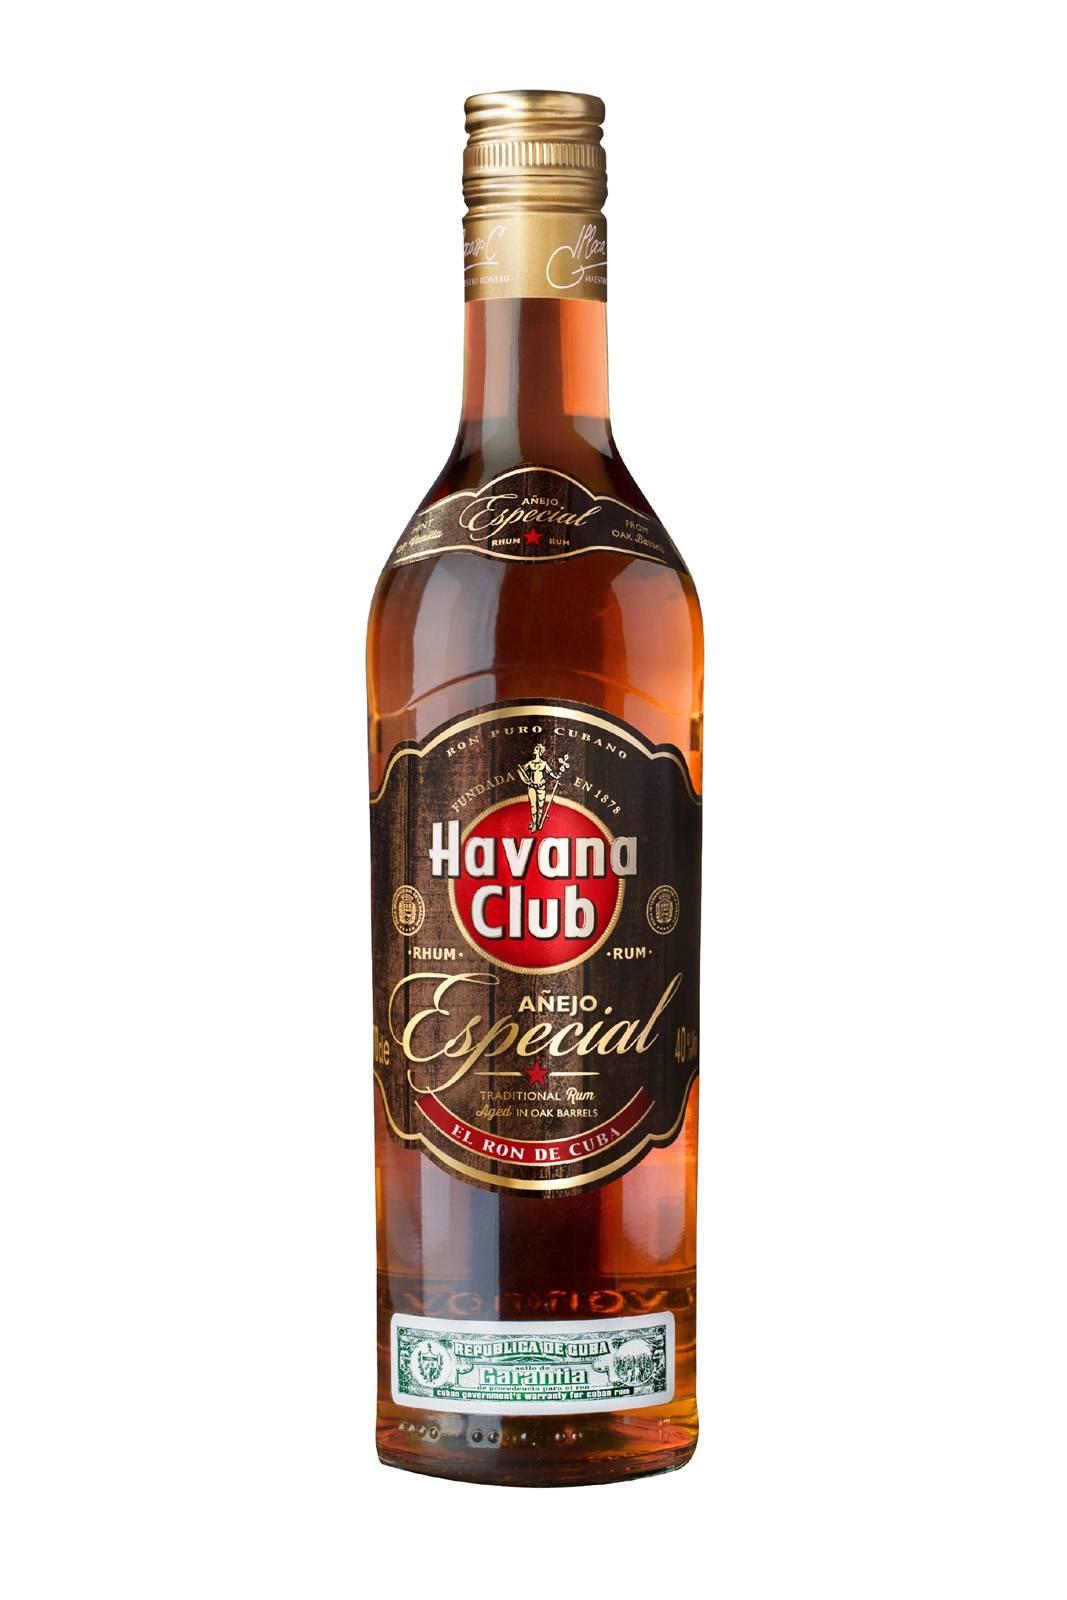 Havana club (гавана клуб): особенности кубинского рома и обзор линейки бренда